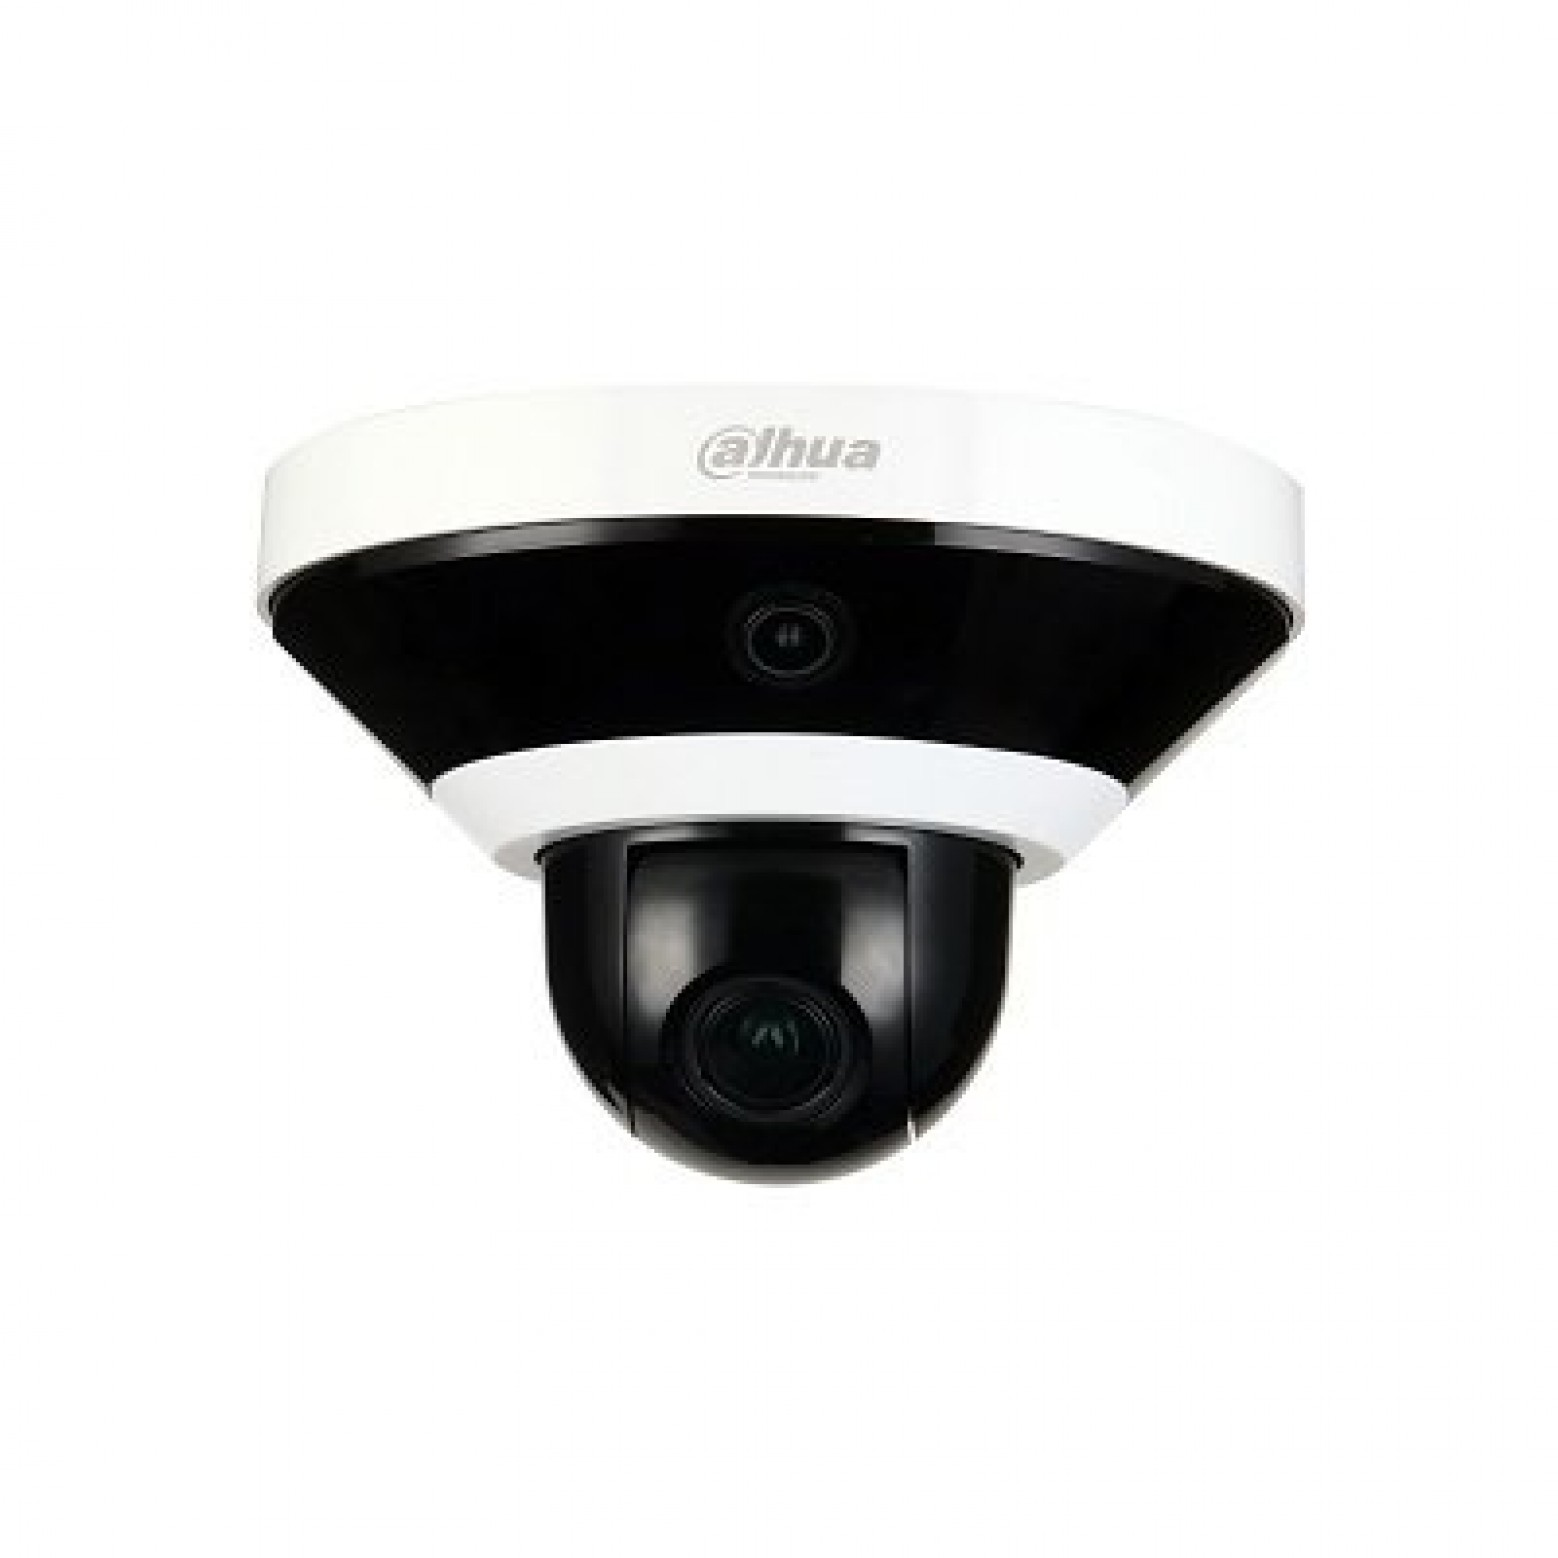 Dahua IPC-PSDW5631S-B360 3x2MP Multi-Sensor Network Camera + PTZ Camera